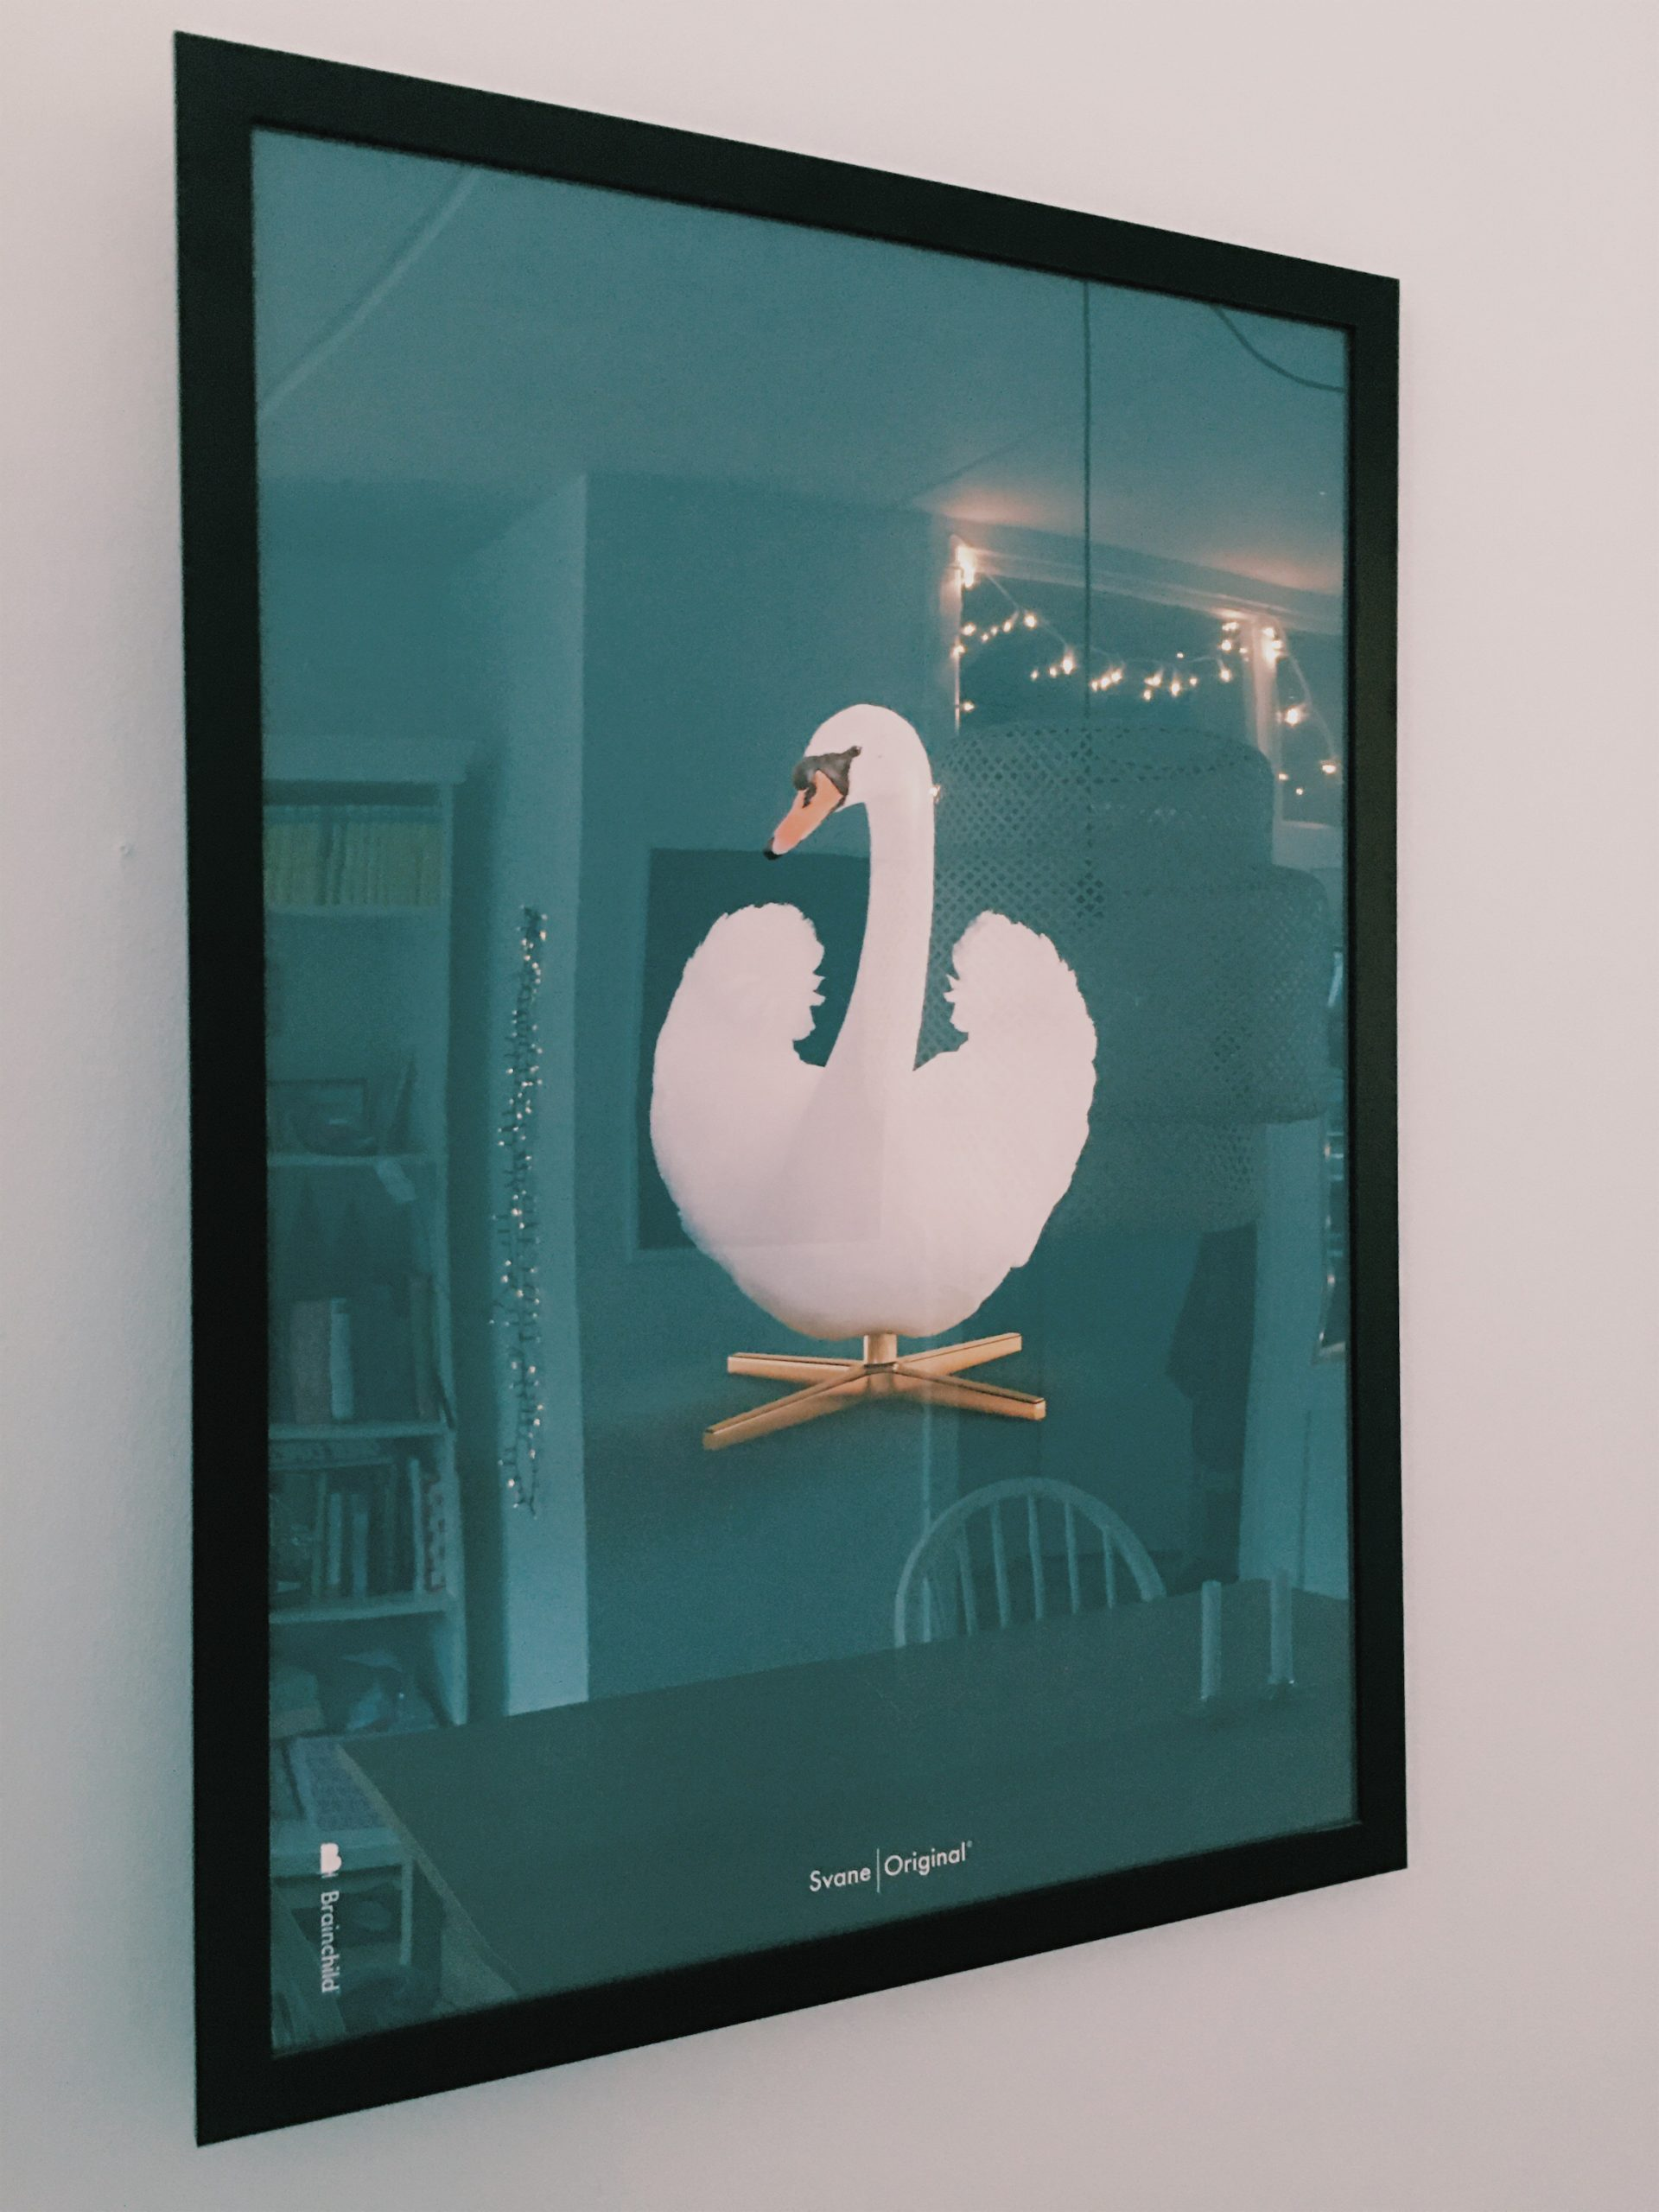 brainchild original plakat svanen arne jacobsen